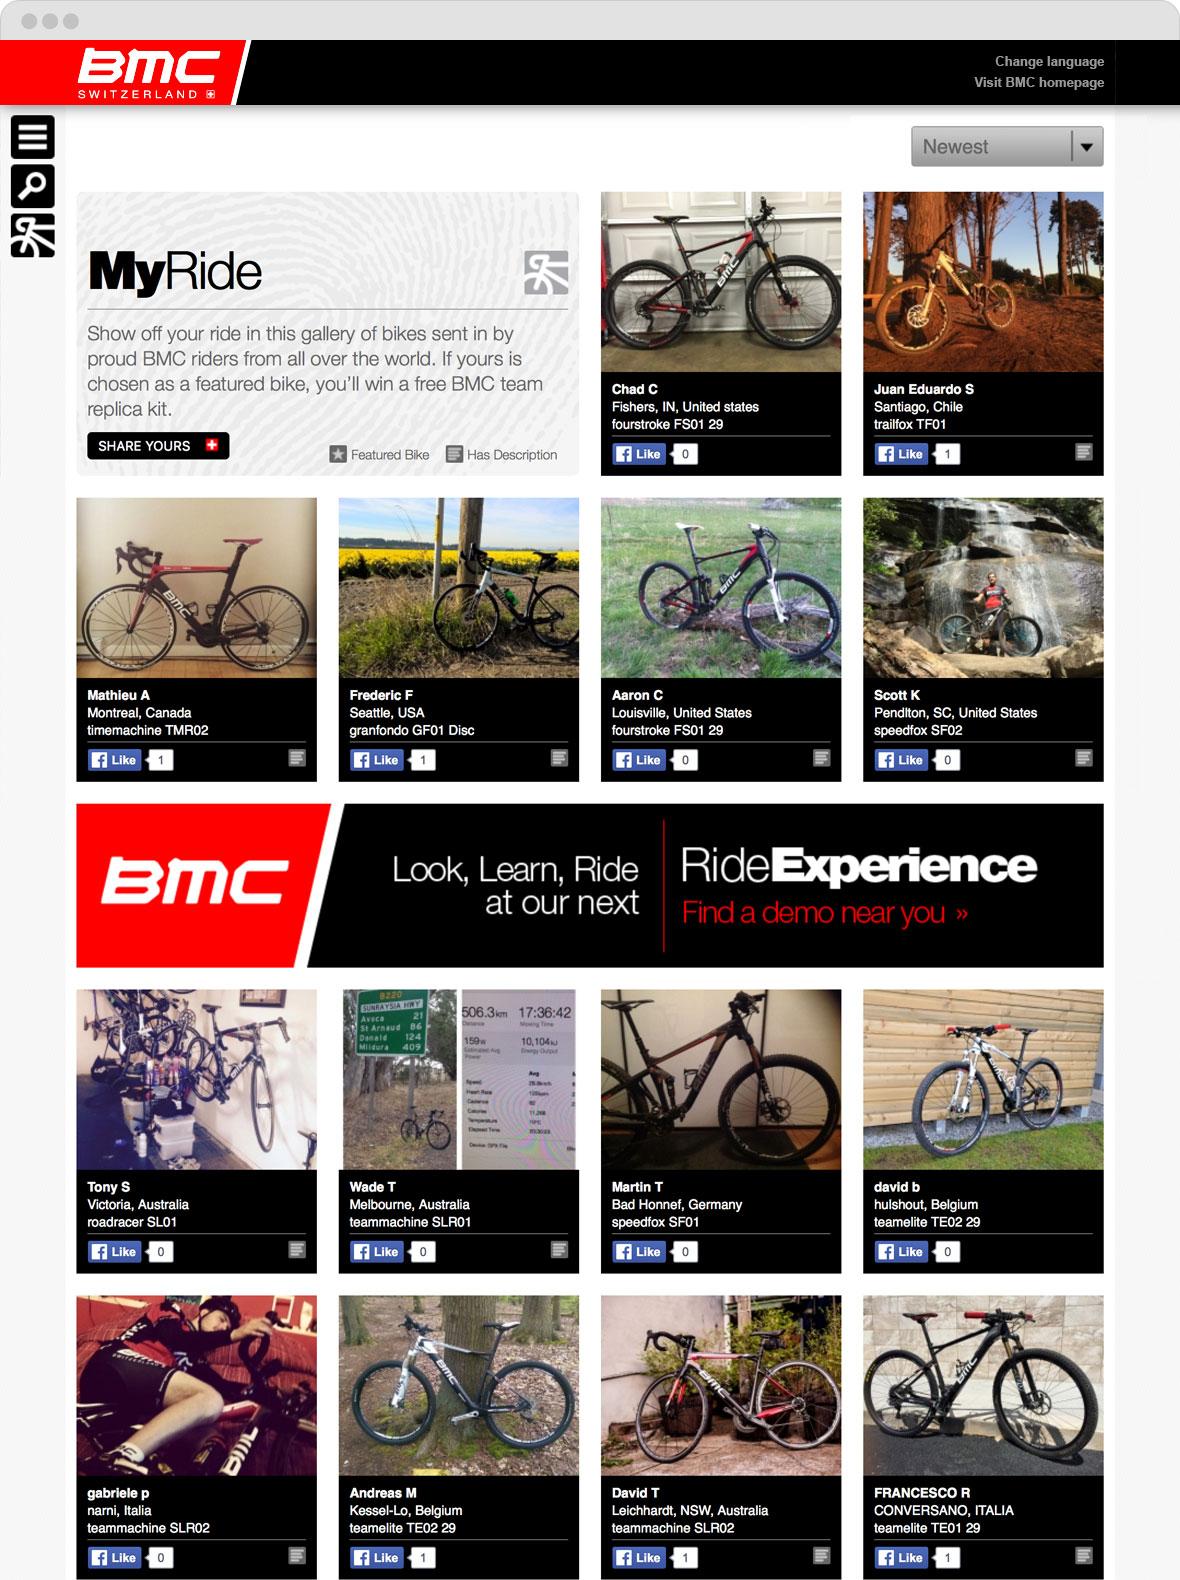 BMC MyRide